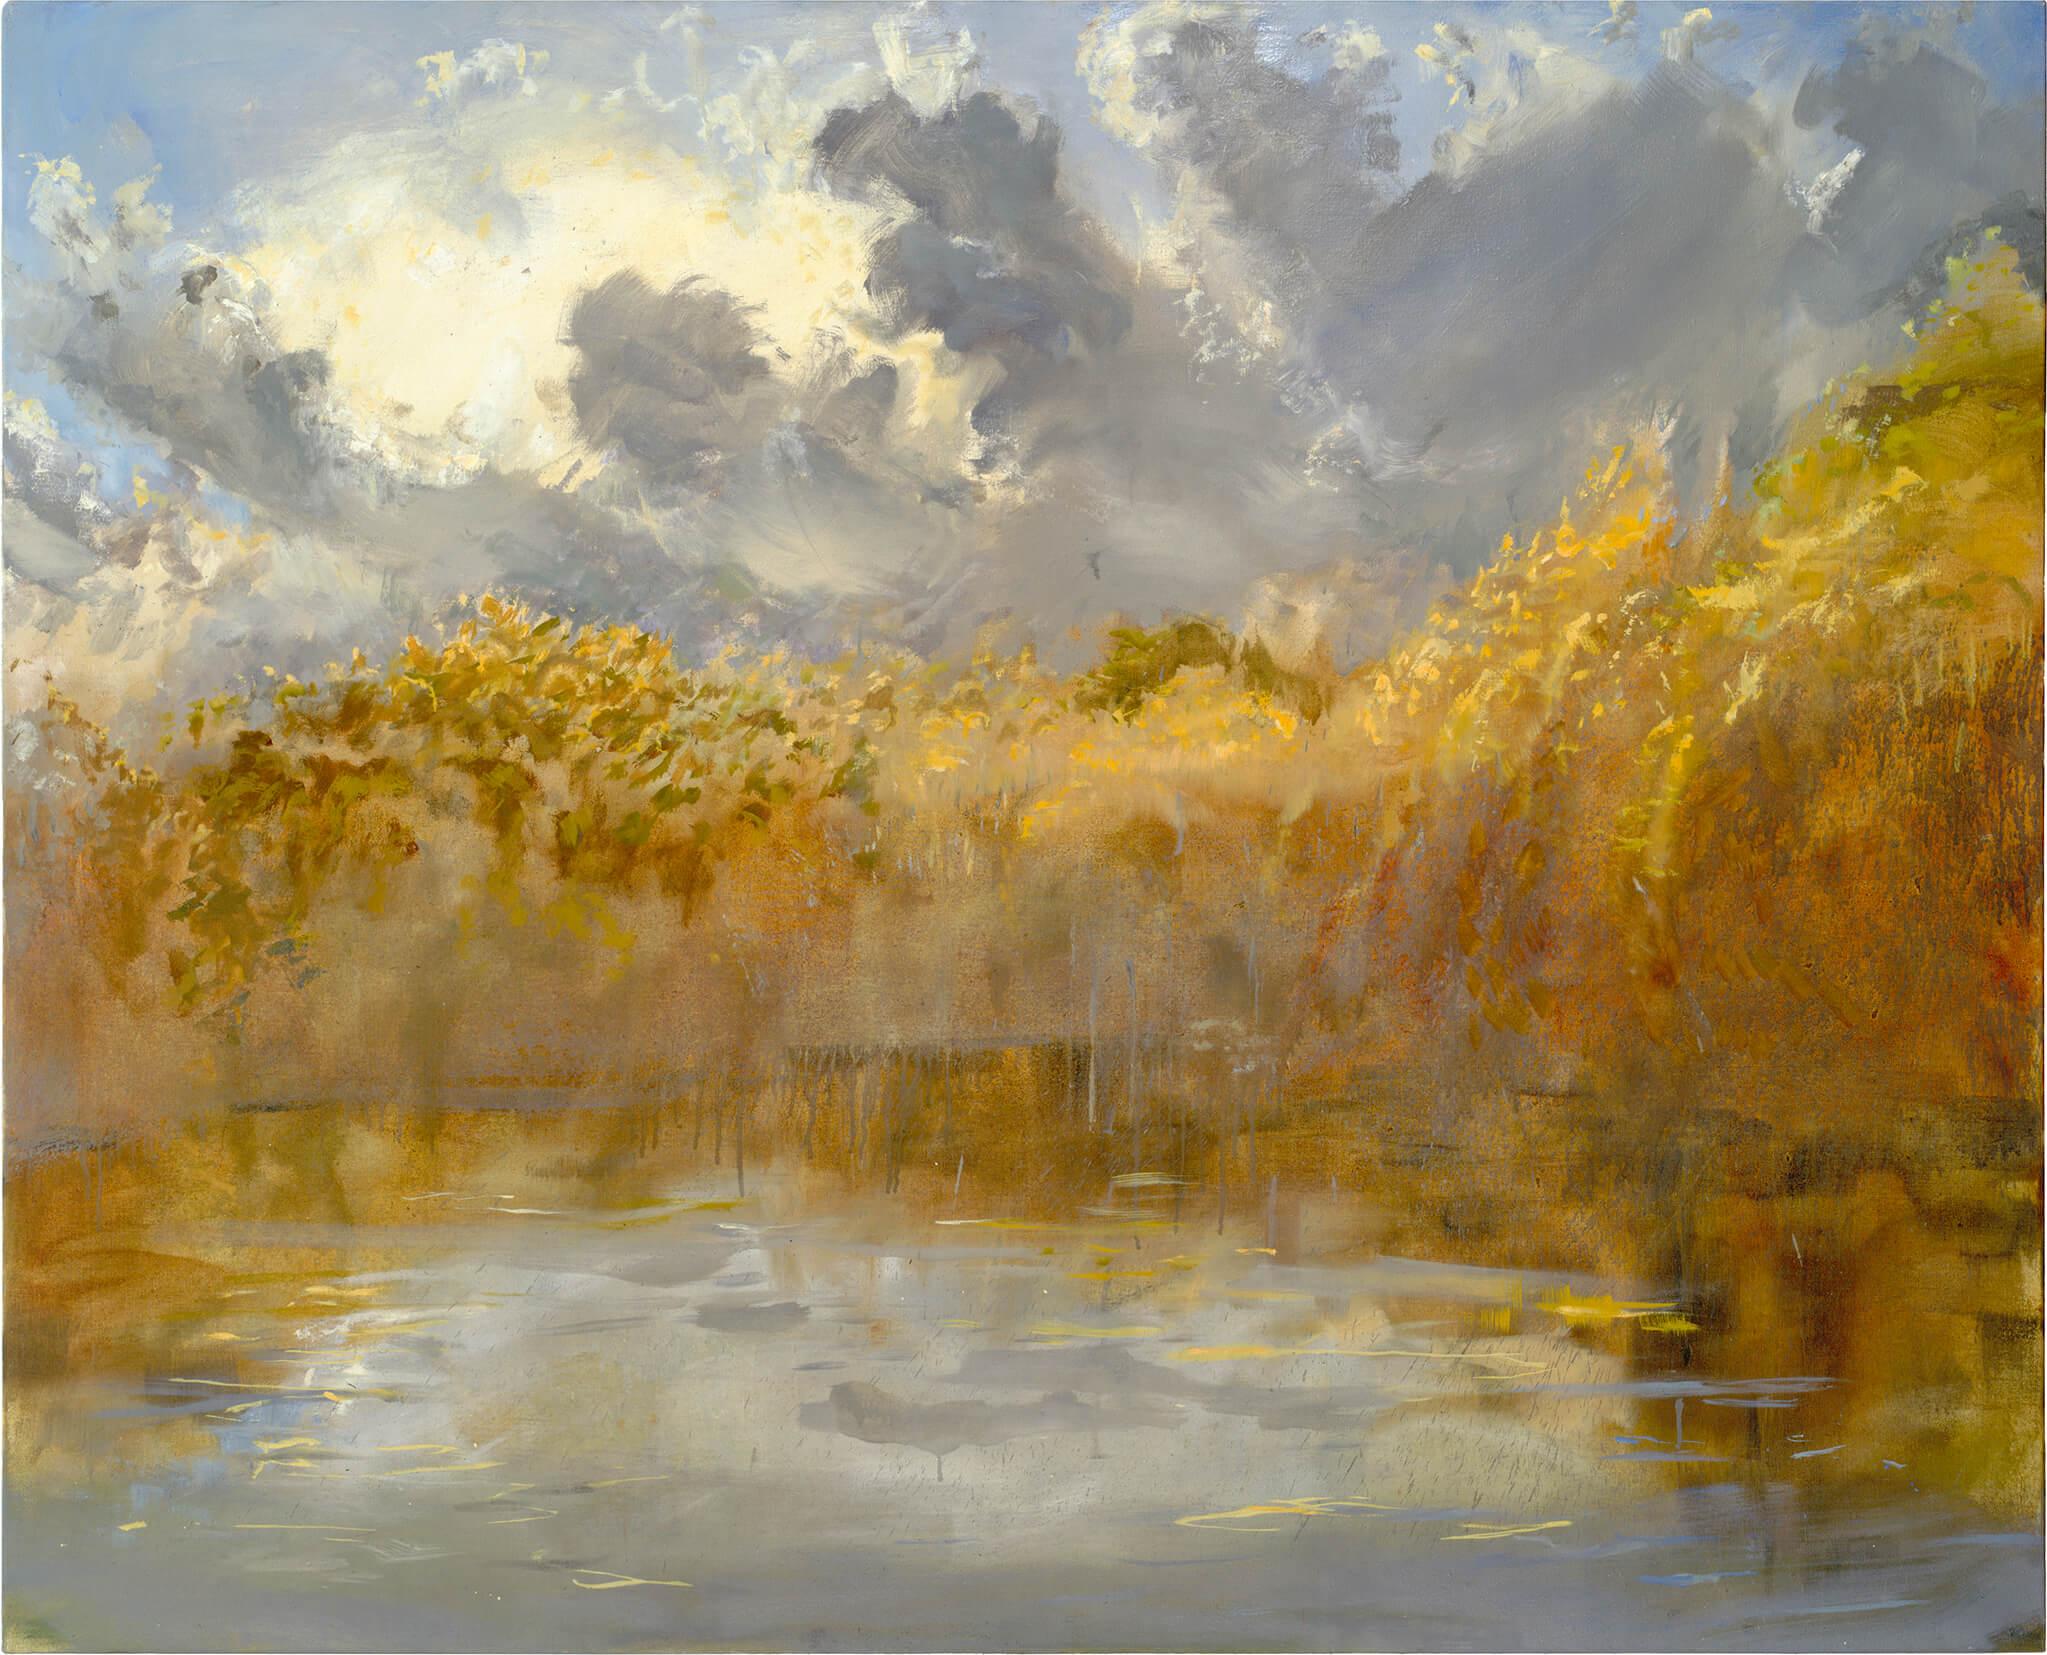 RHSK014 Matsubarako Lake Autumn Evening ( Oil on Linen ) 131 x 162 cm